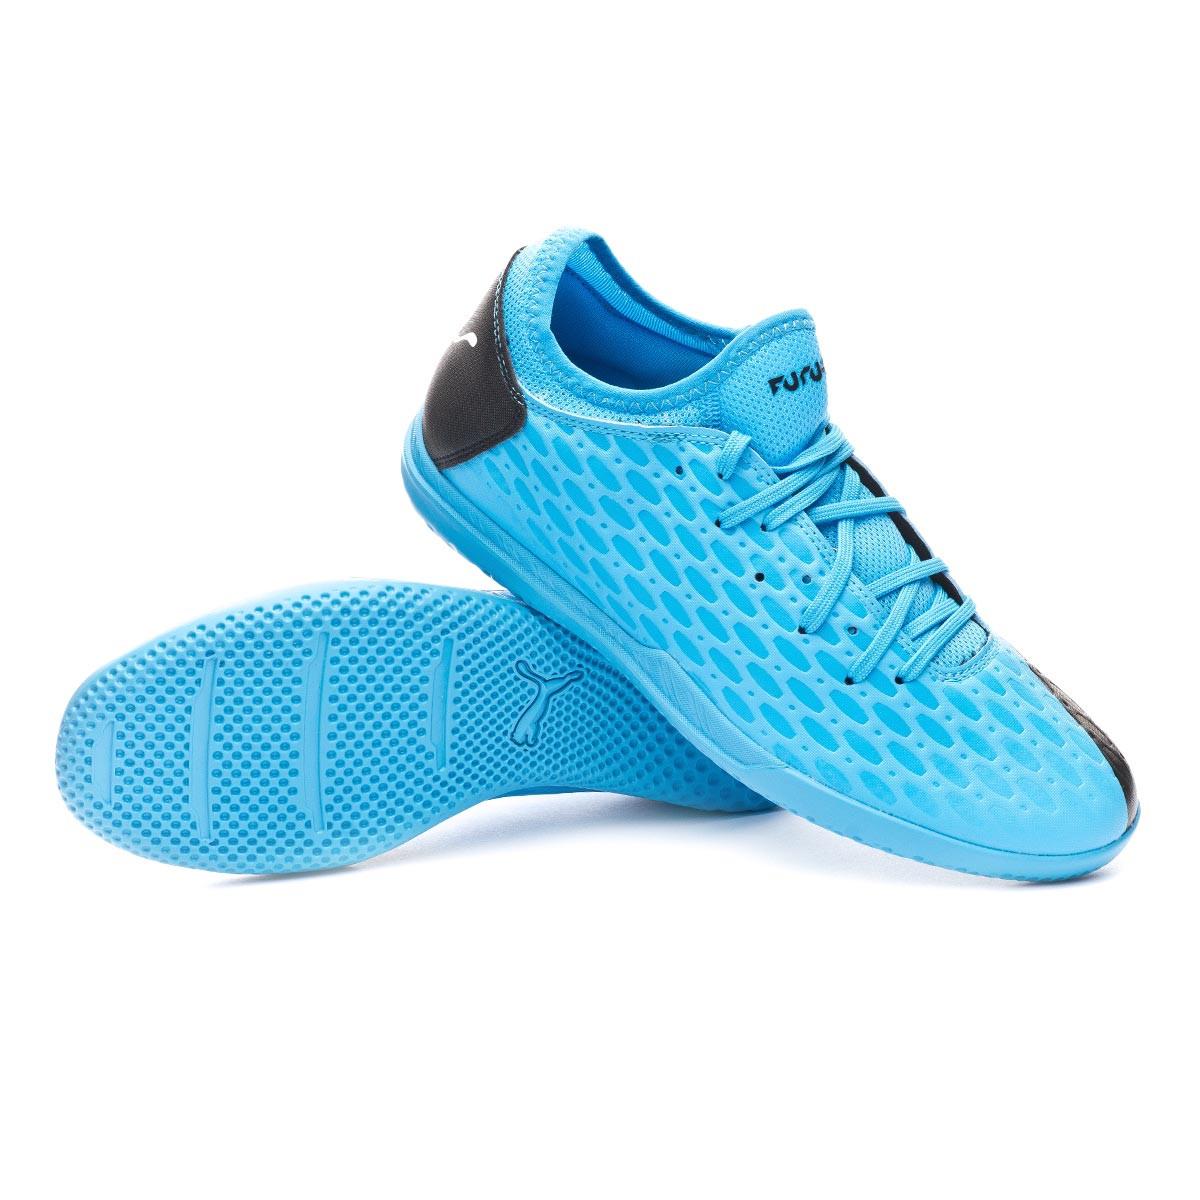 Futsal Boot Puma Future 5.4 IT Luminous Blue-Nrgy Blue-Puma Black ...